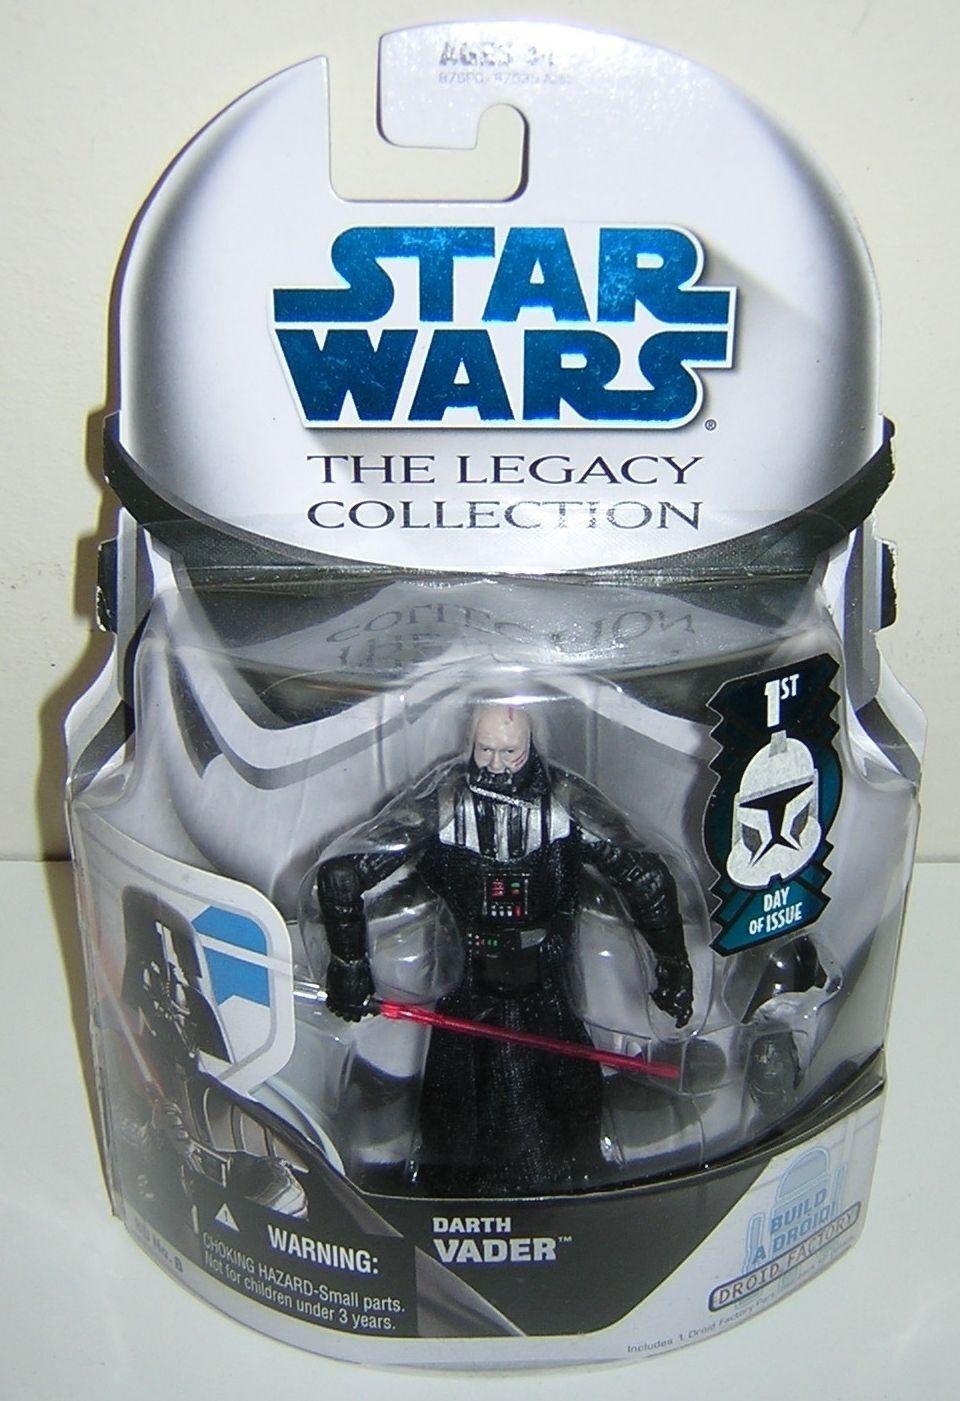 Star wars legacy collection bd8 darth vader 1. tag - frage